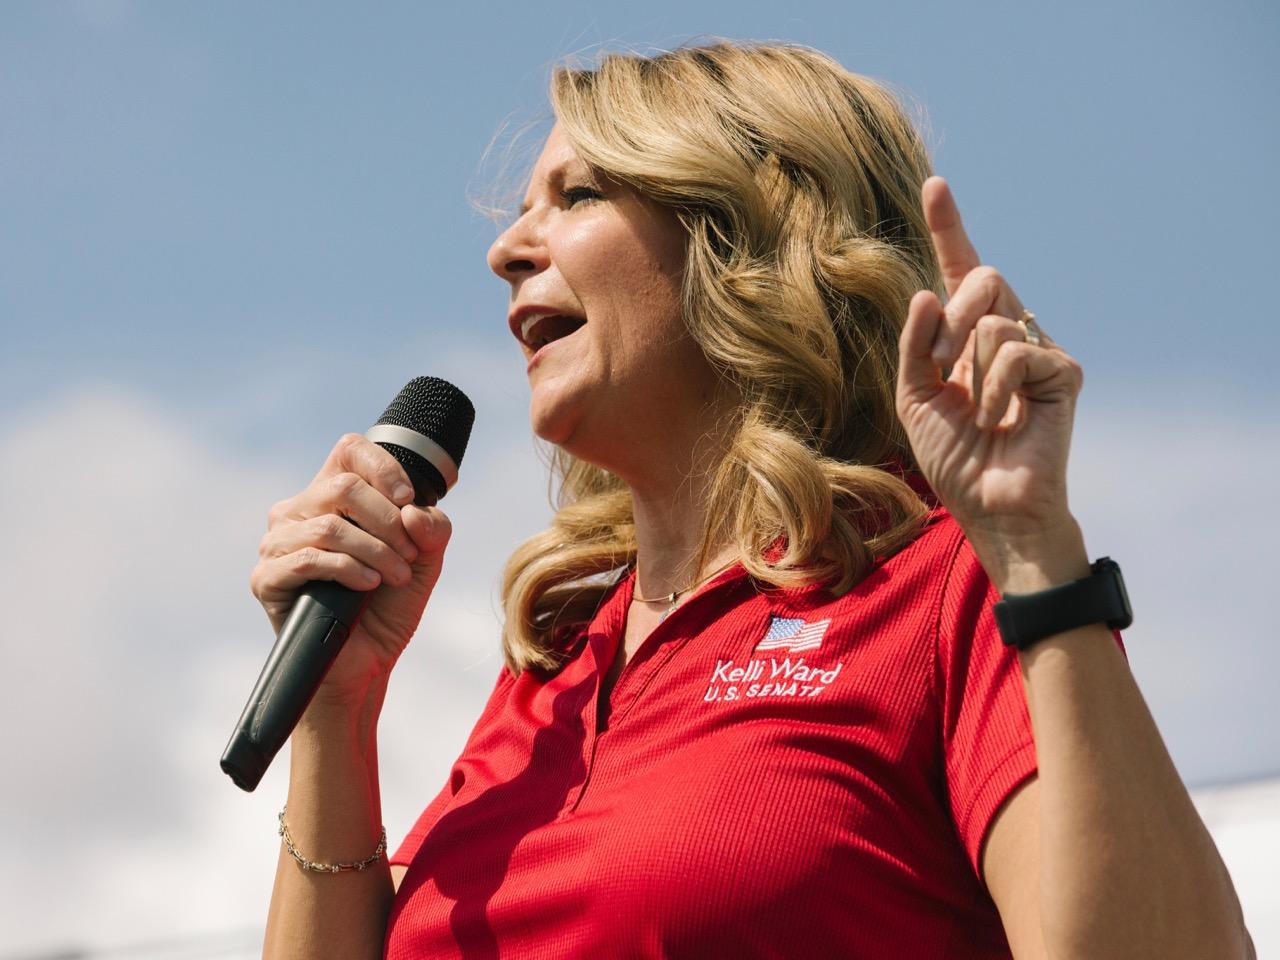 Senate Candidate Kelli Ward 'Road To Victory' Campaign Tour